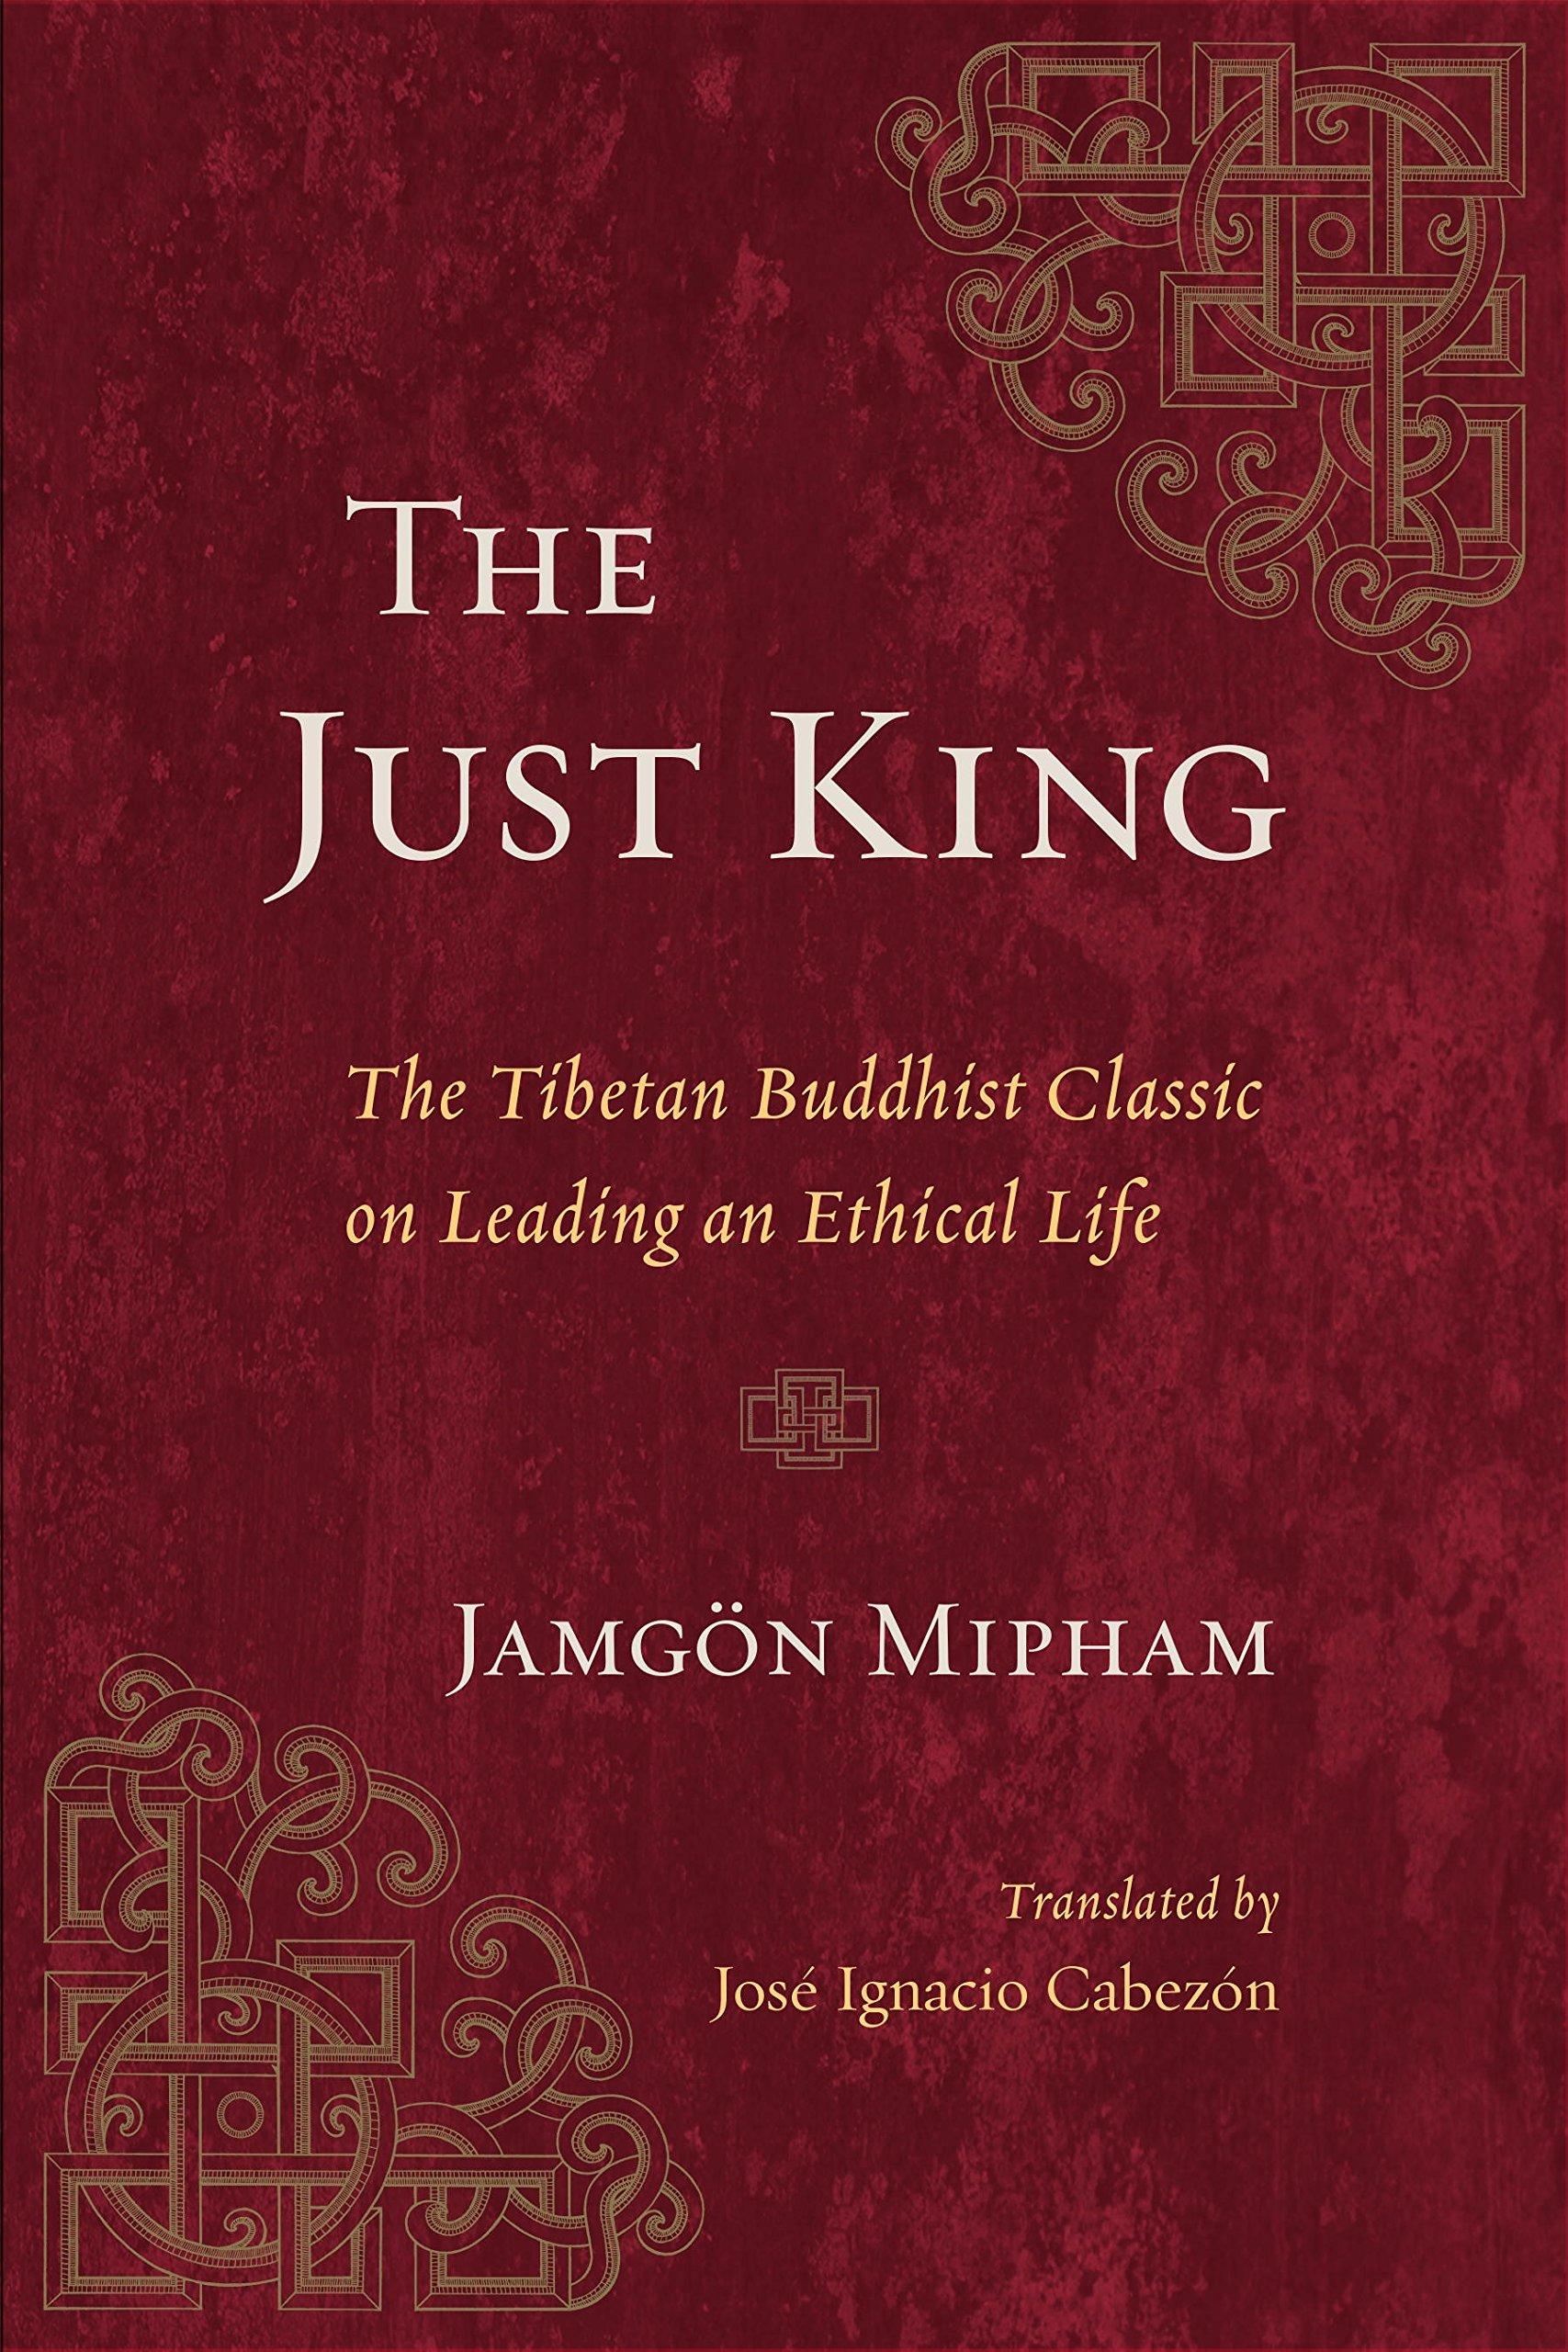 Amazon the just king the tibetan buddhist classic on leading amazon the just king the tibetan buddhist classic on leading an ethical life 9781611804966 jamgon mipham jose ignacio cabezon books fandeluxe Image collections